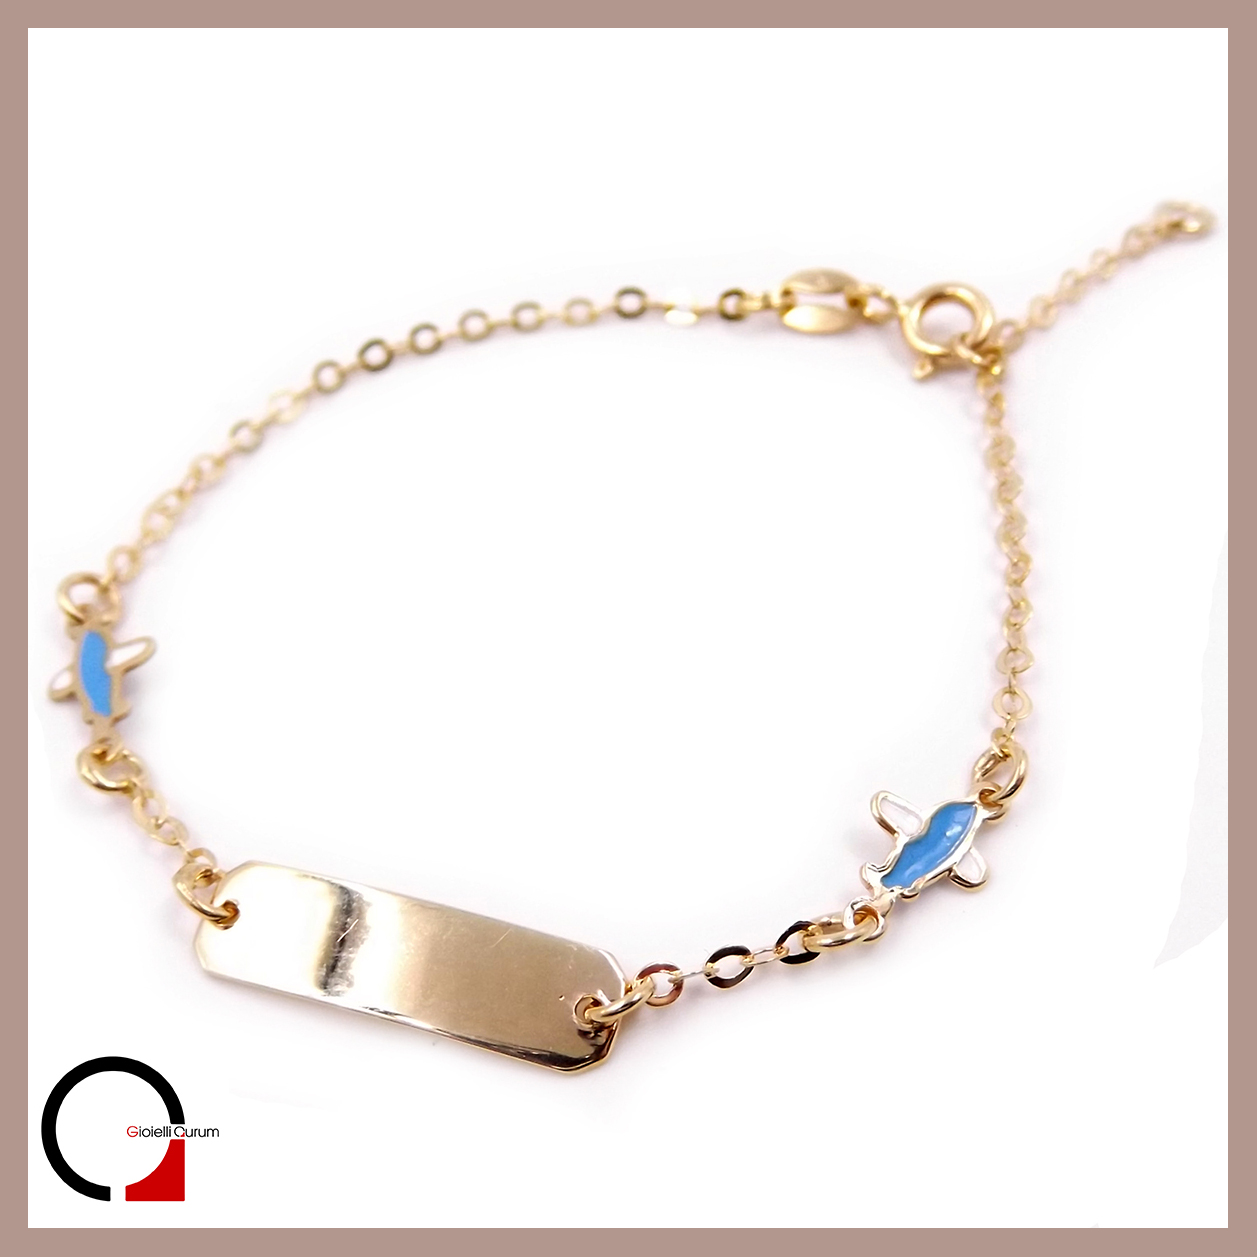 Bracciale Oro Battesimo Bambino.Baby Bracelet In Yellow Baby Bracelet With Enamel Christening Air